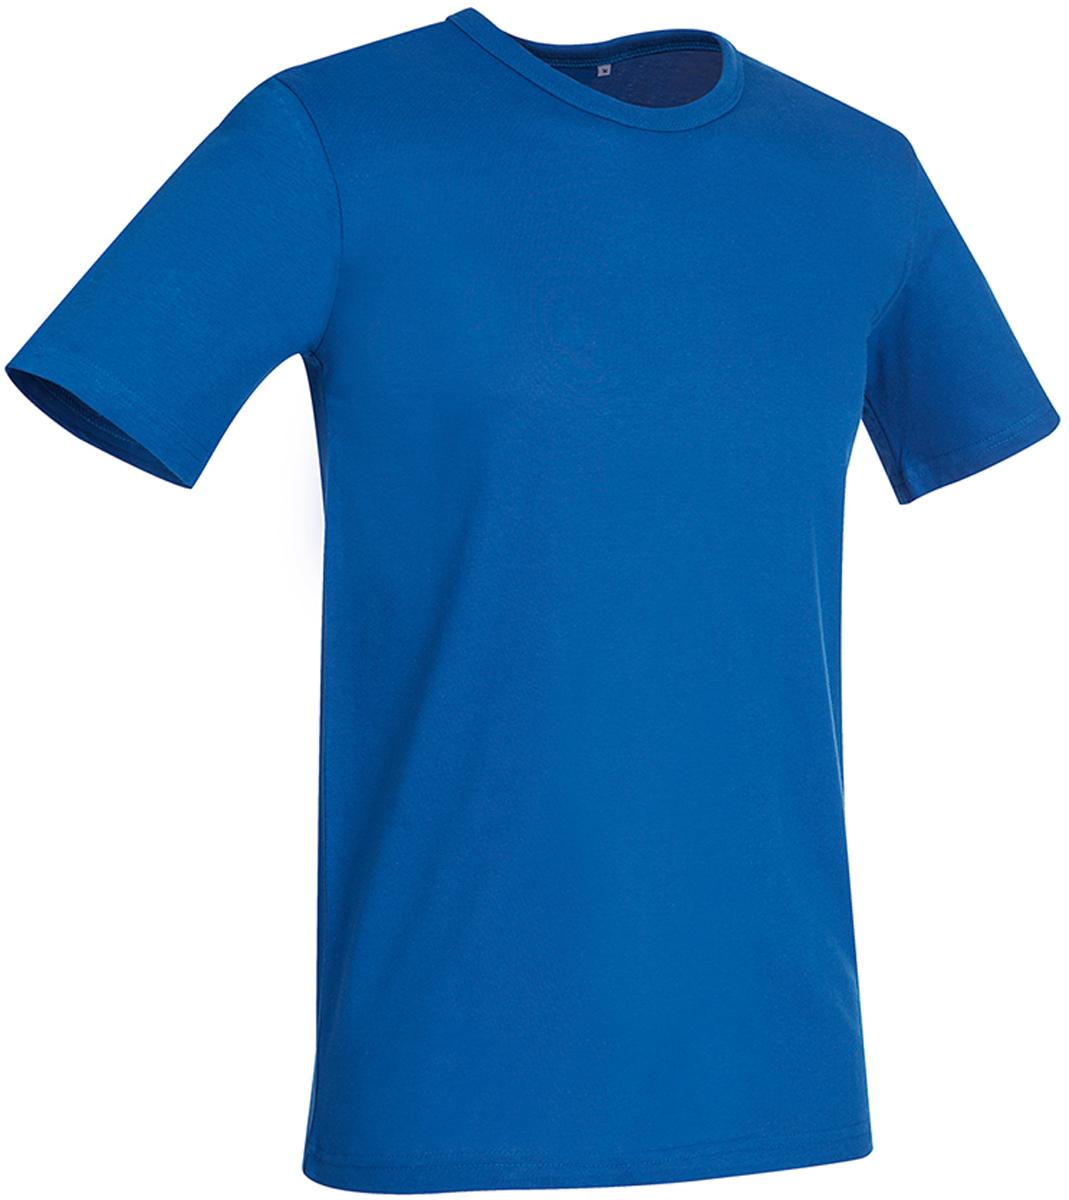 be14ee23 Stedman Stars Men Adults Casual Wear Body Fit T-Shirt Morgan Crew ...